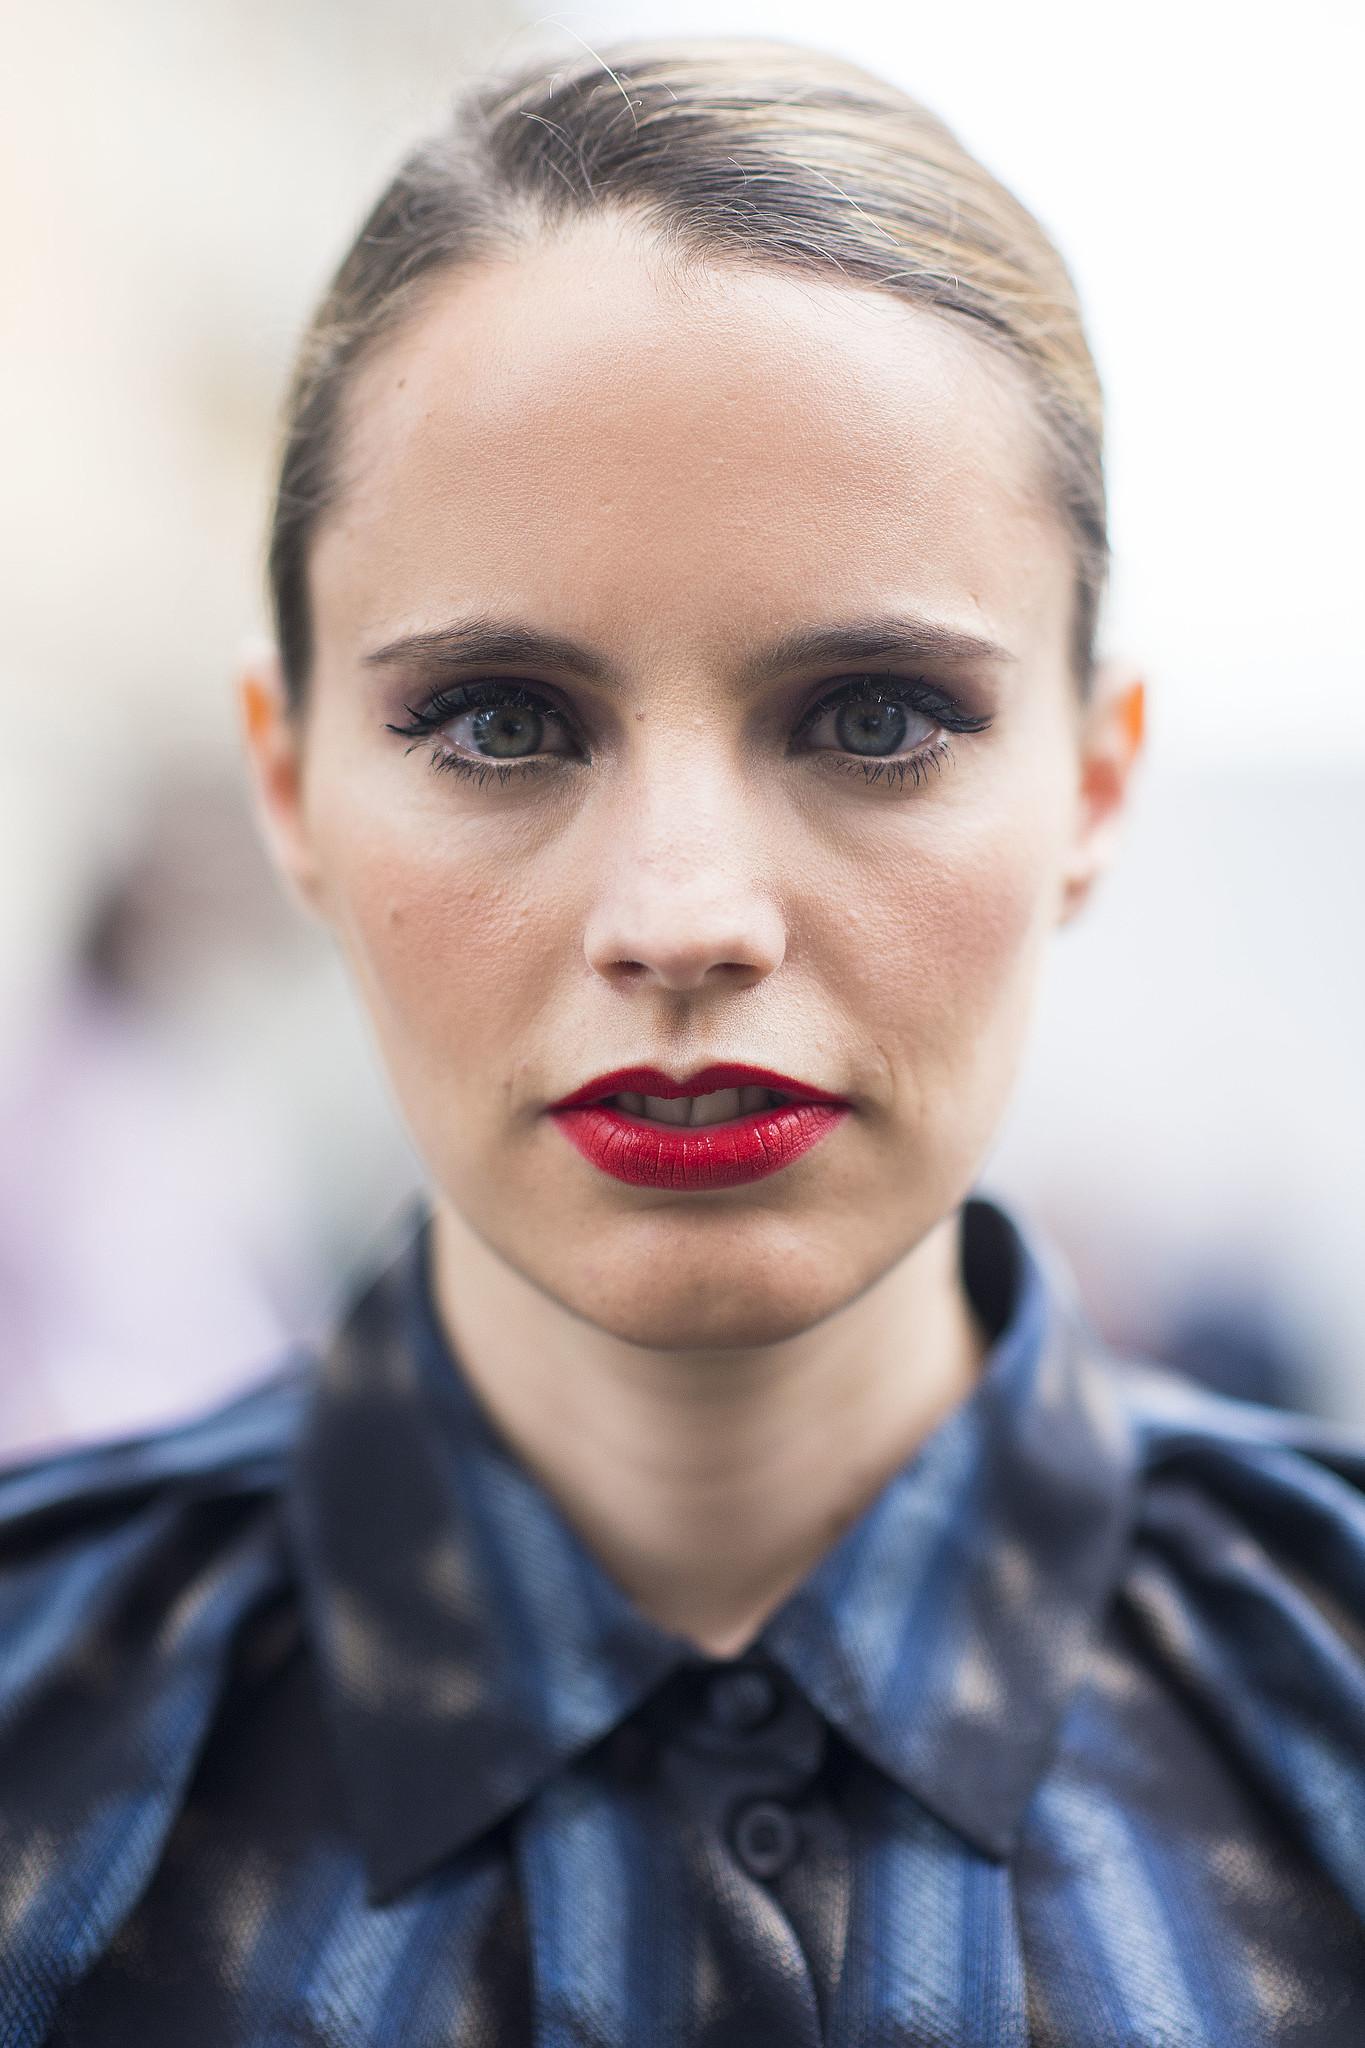 Graphic liner makes her red lip seem more modern than vintage. Source: Le 21ème | Adam Katz Sinding